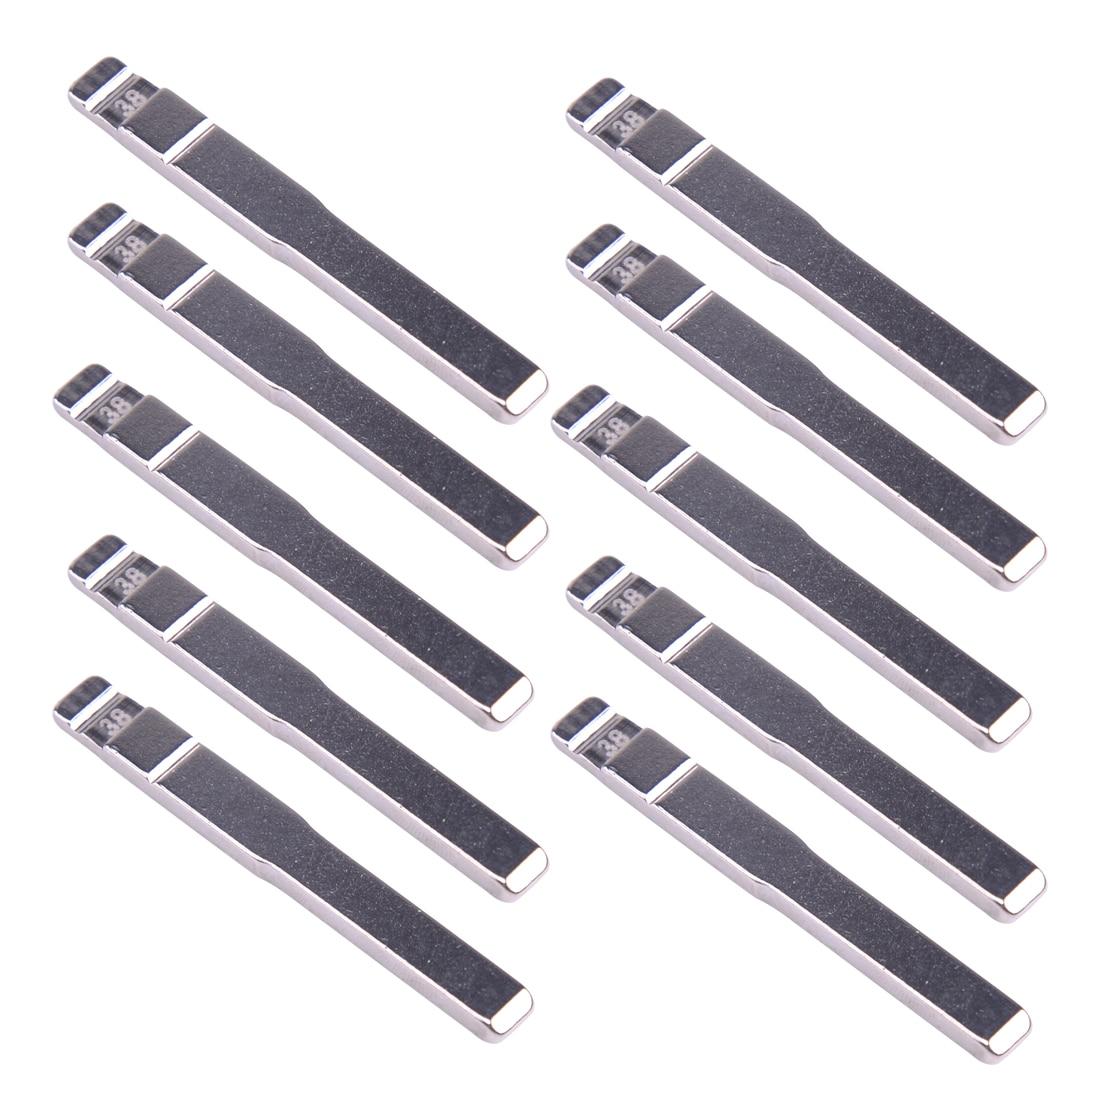 Beler Silver 10pcs 58# Uncut Flip KD Remote Lot Key Blade Blank Fit For Citroen Peugeot VA2